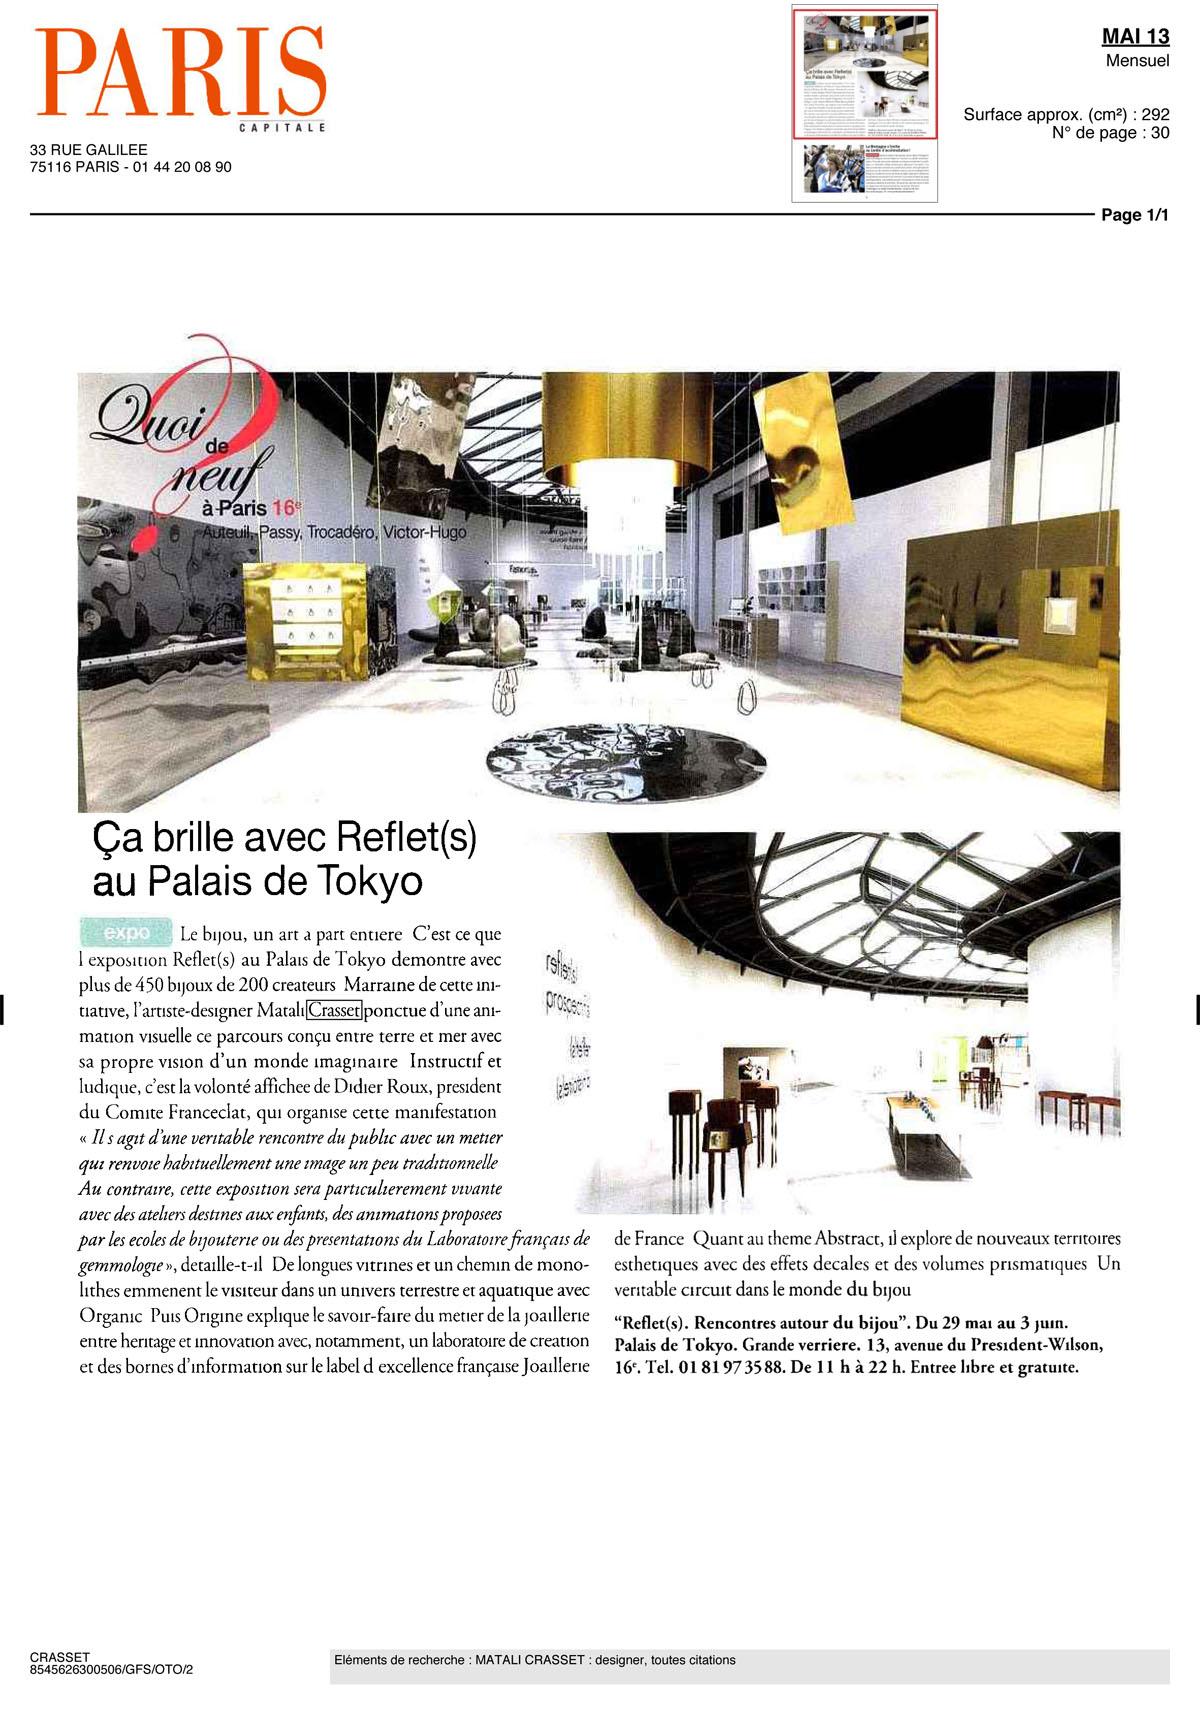 2013-05-11~1458@PARIS_CAPITALE.jpg